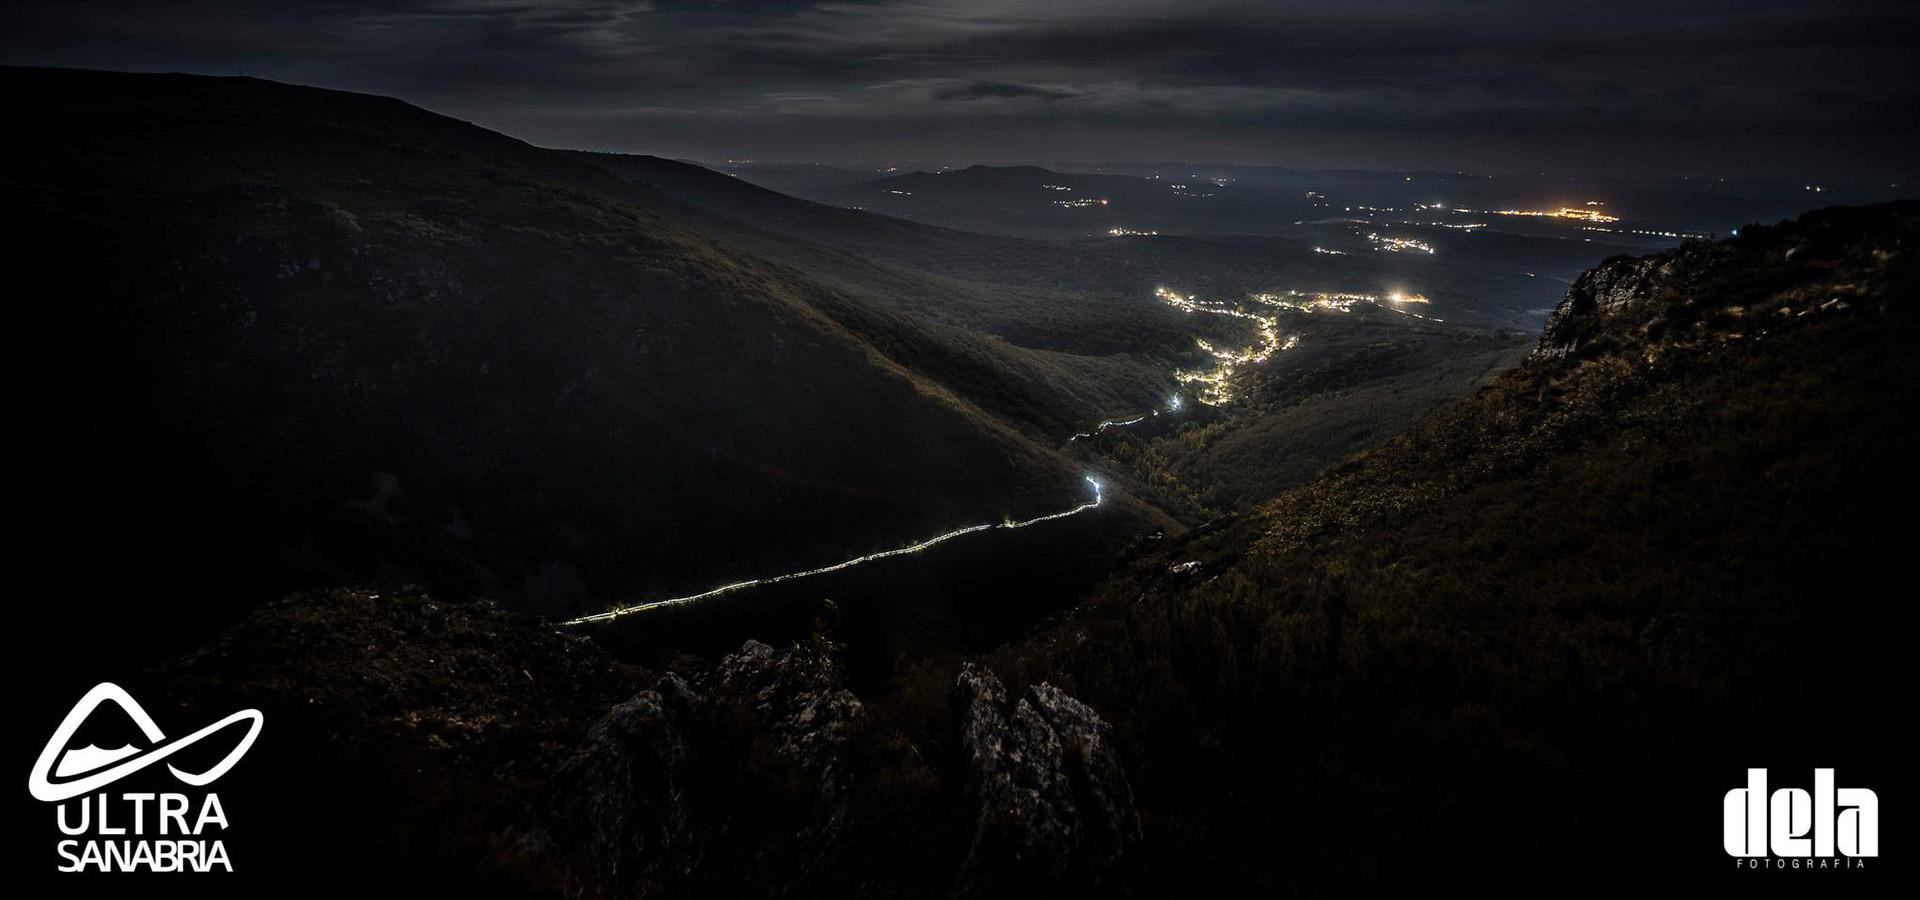 Ultra Sanabria Trail - Slider 2020